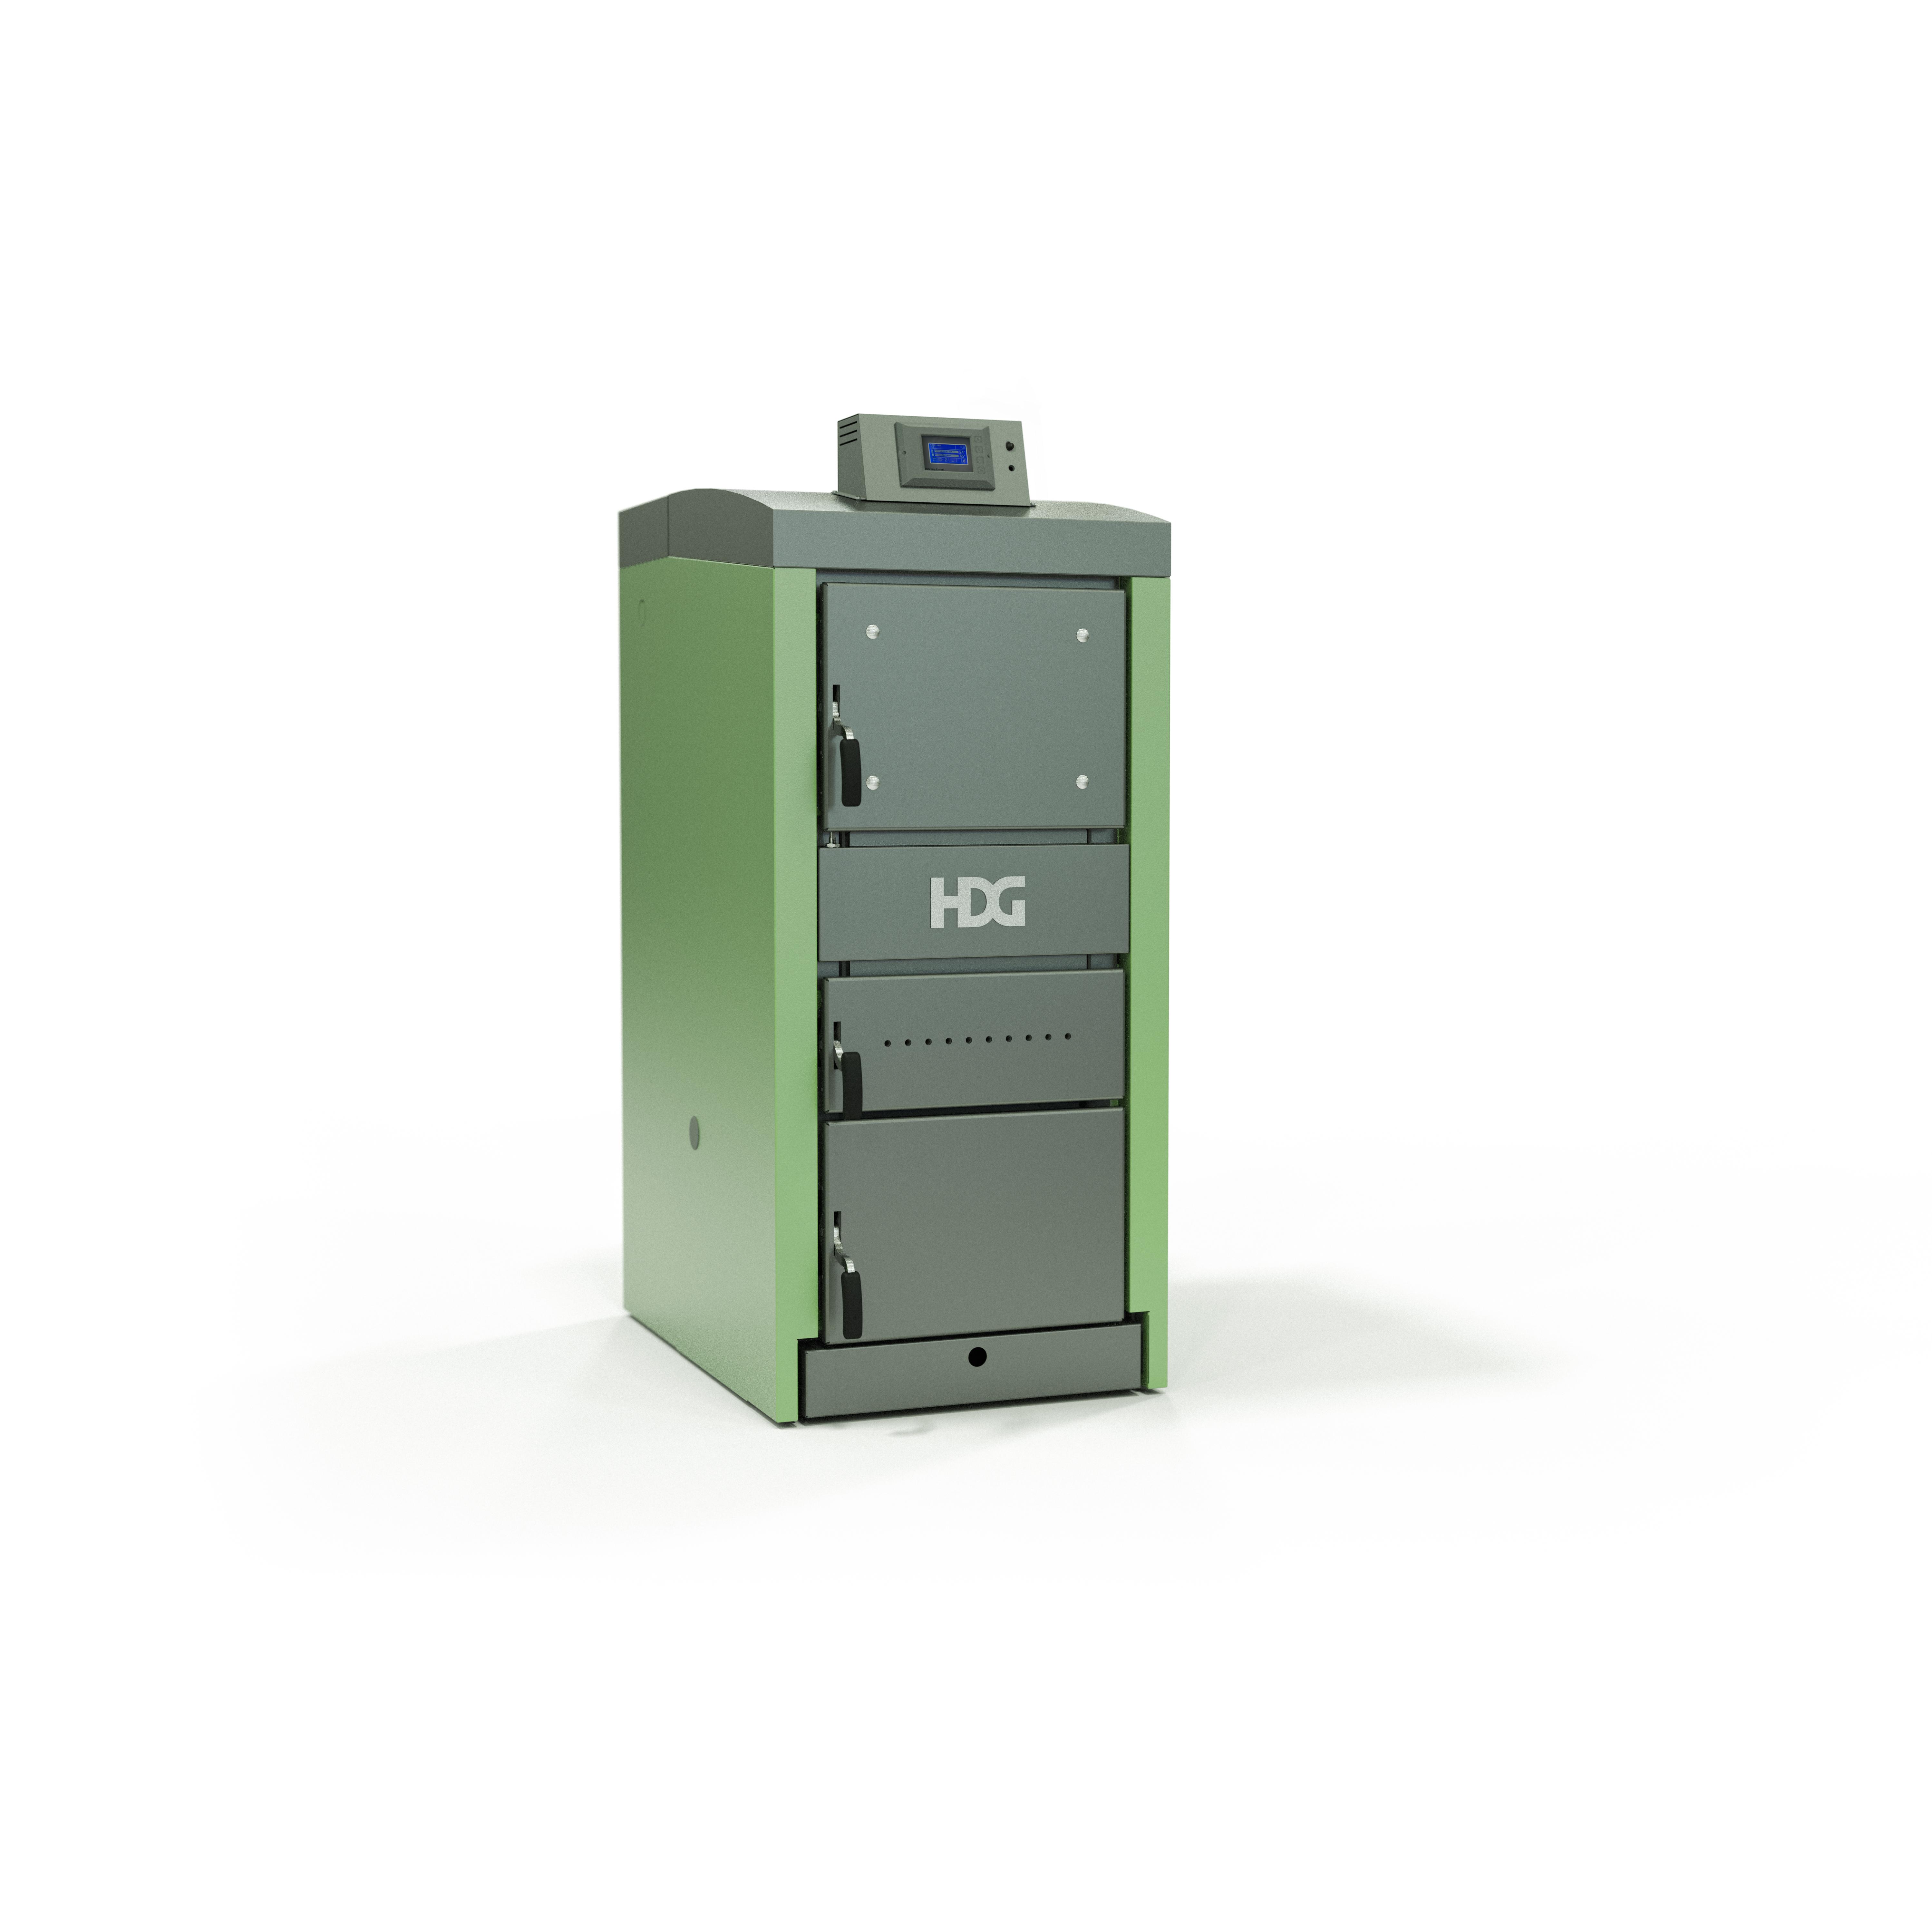 HDG R 15 - 20 - 25 - 30